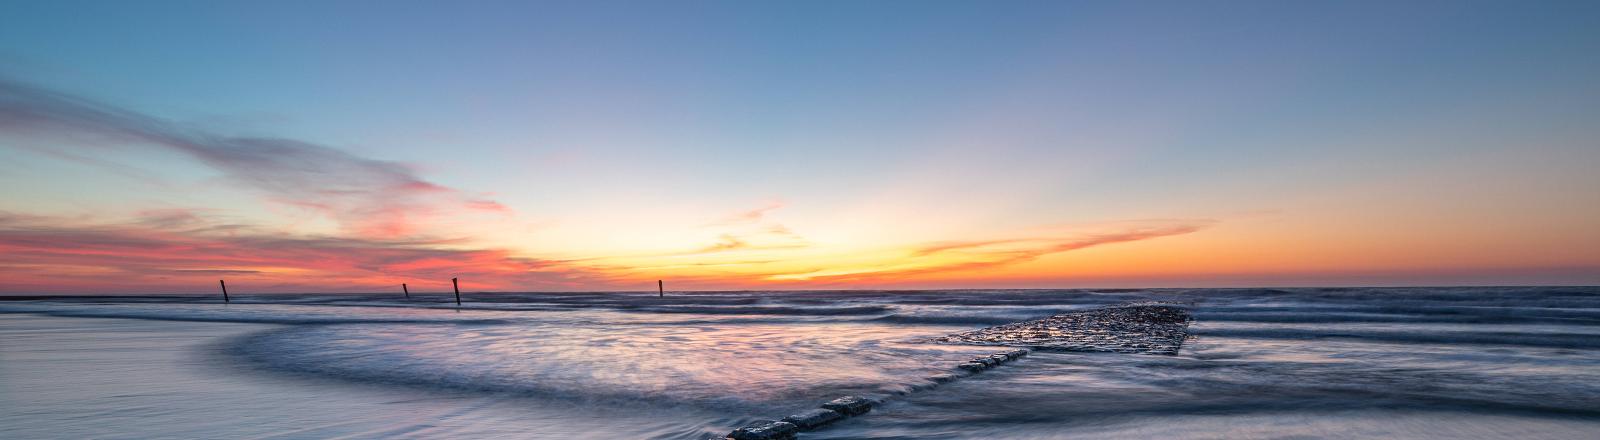 Norderney, am 15. April 2020: Sonnenuntergang im Wattenmeer, der Nordstrand von Norderney.